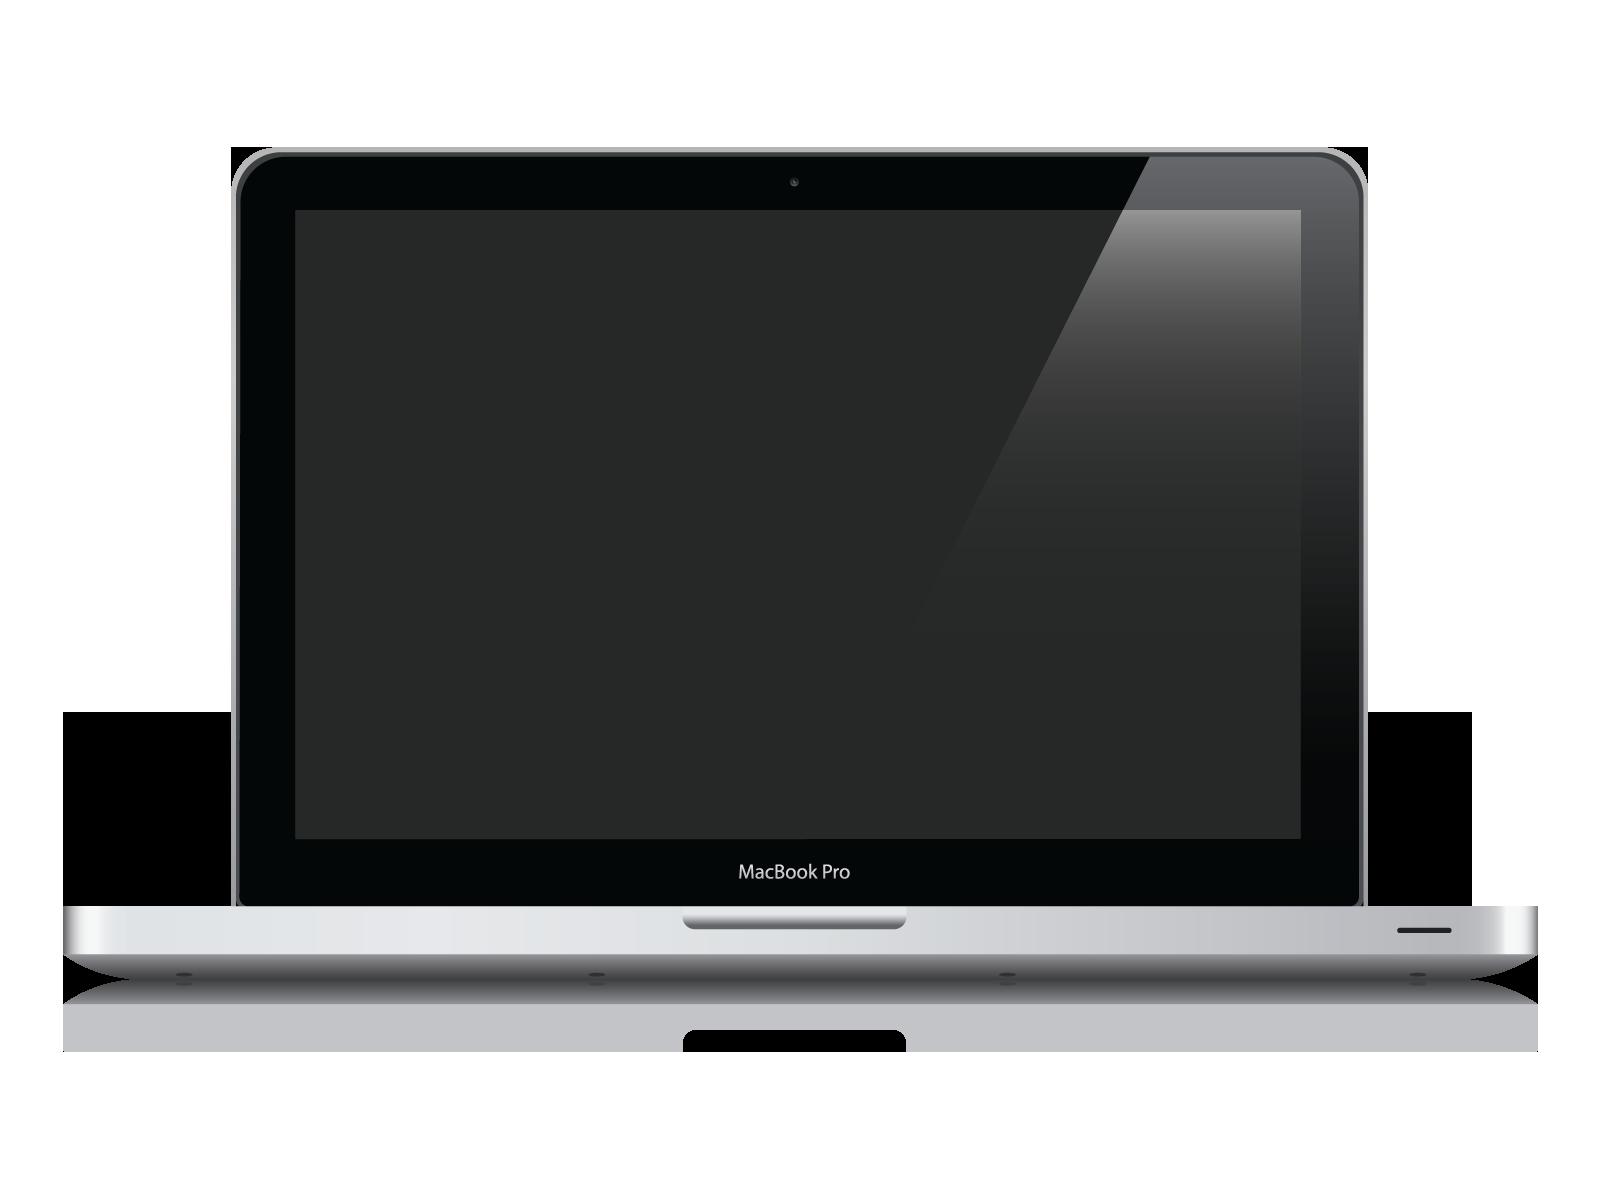 Macbook Png Image Macbook Mobile Computing Top Computer